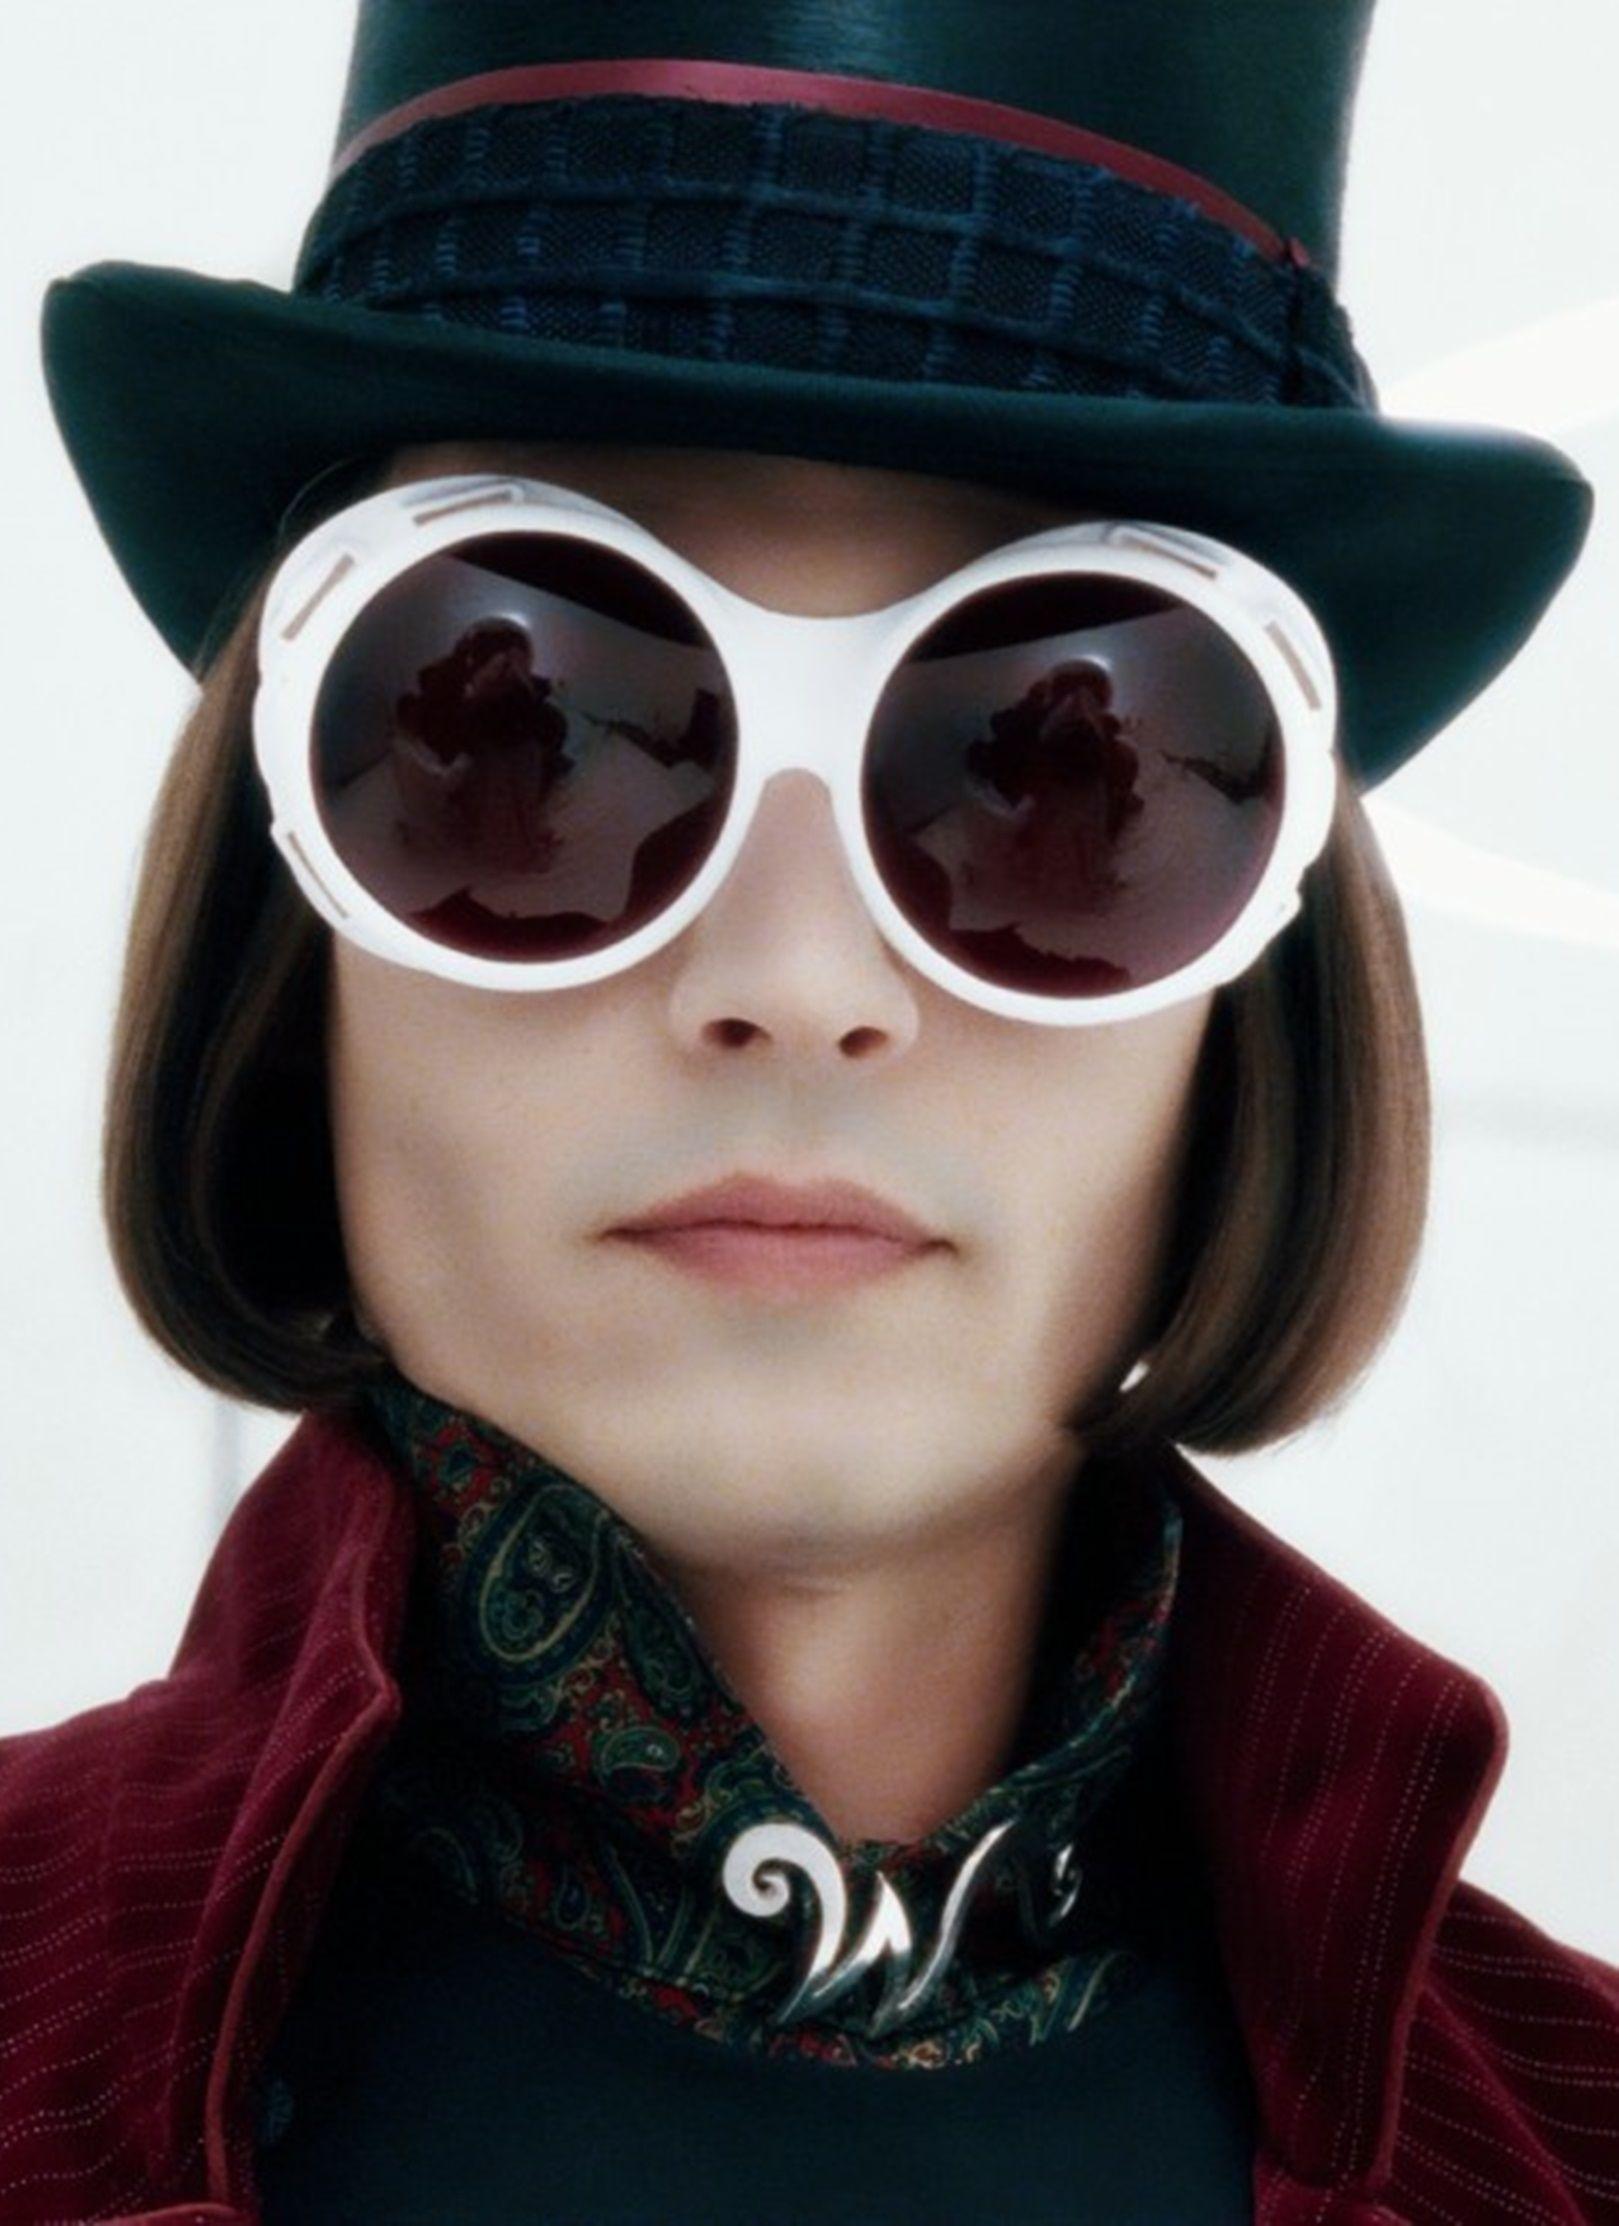 Charlie Chocolate Factory Willy Wonka